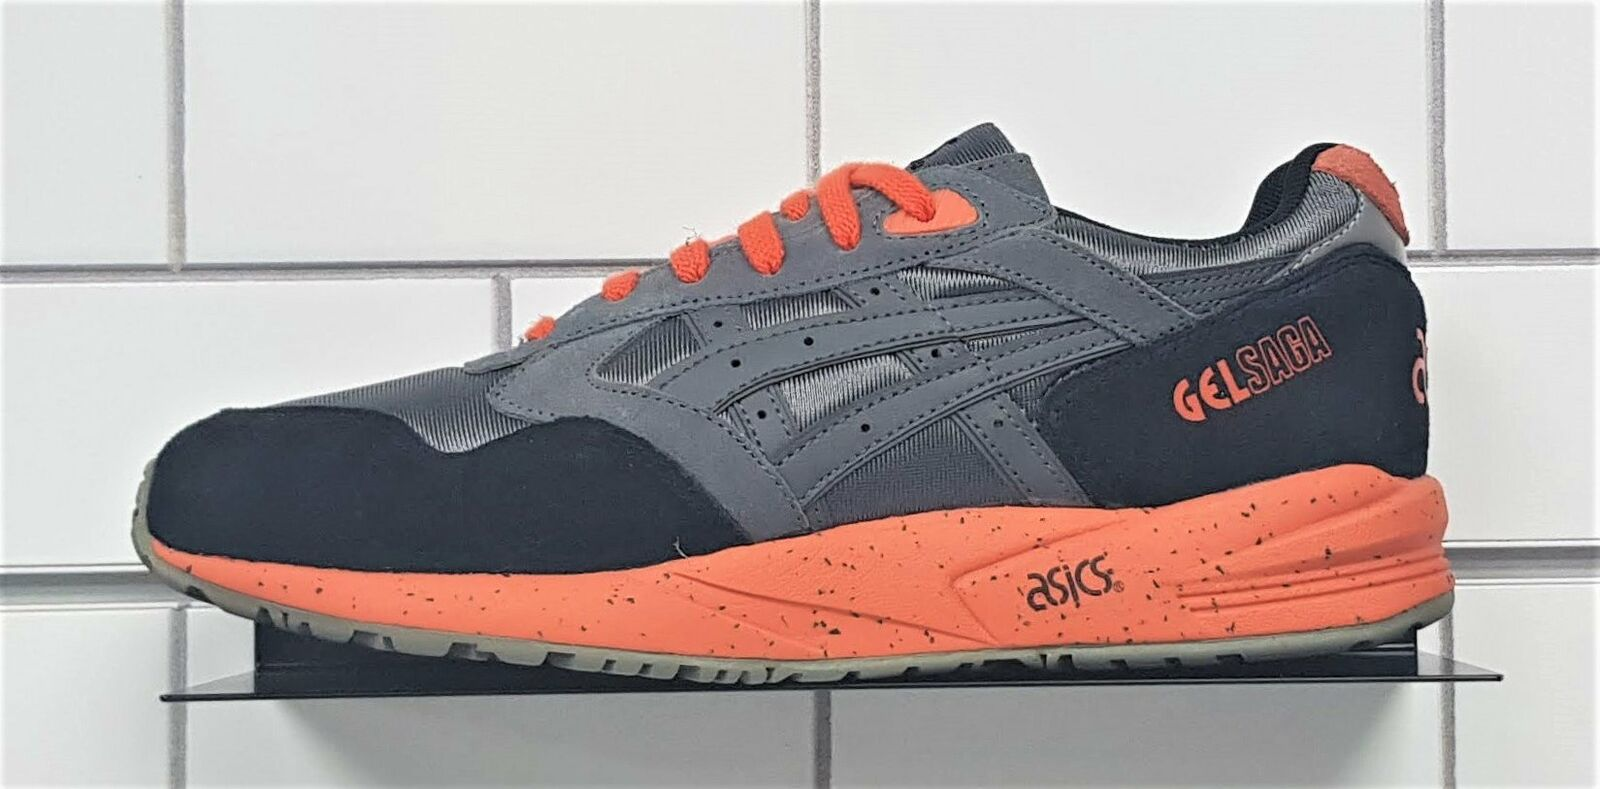 Asics Gel-Saga Sneakers, Sneakers, Sneakers, Grey   orange 67668a